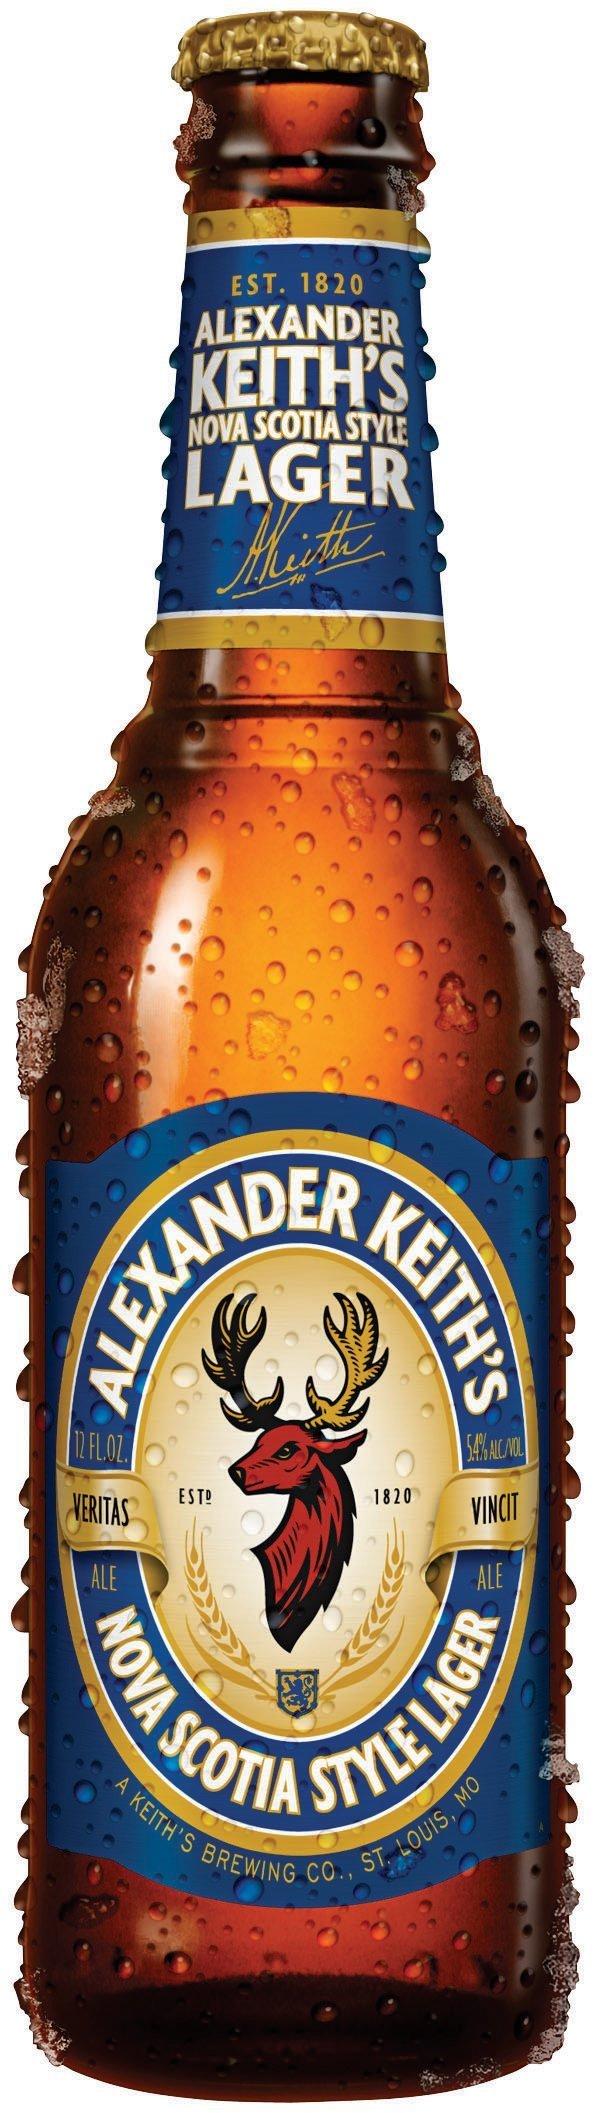 Alexander Keith's Nova Scotia Style Lager